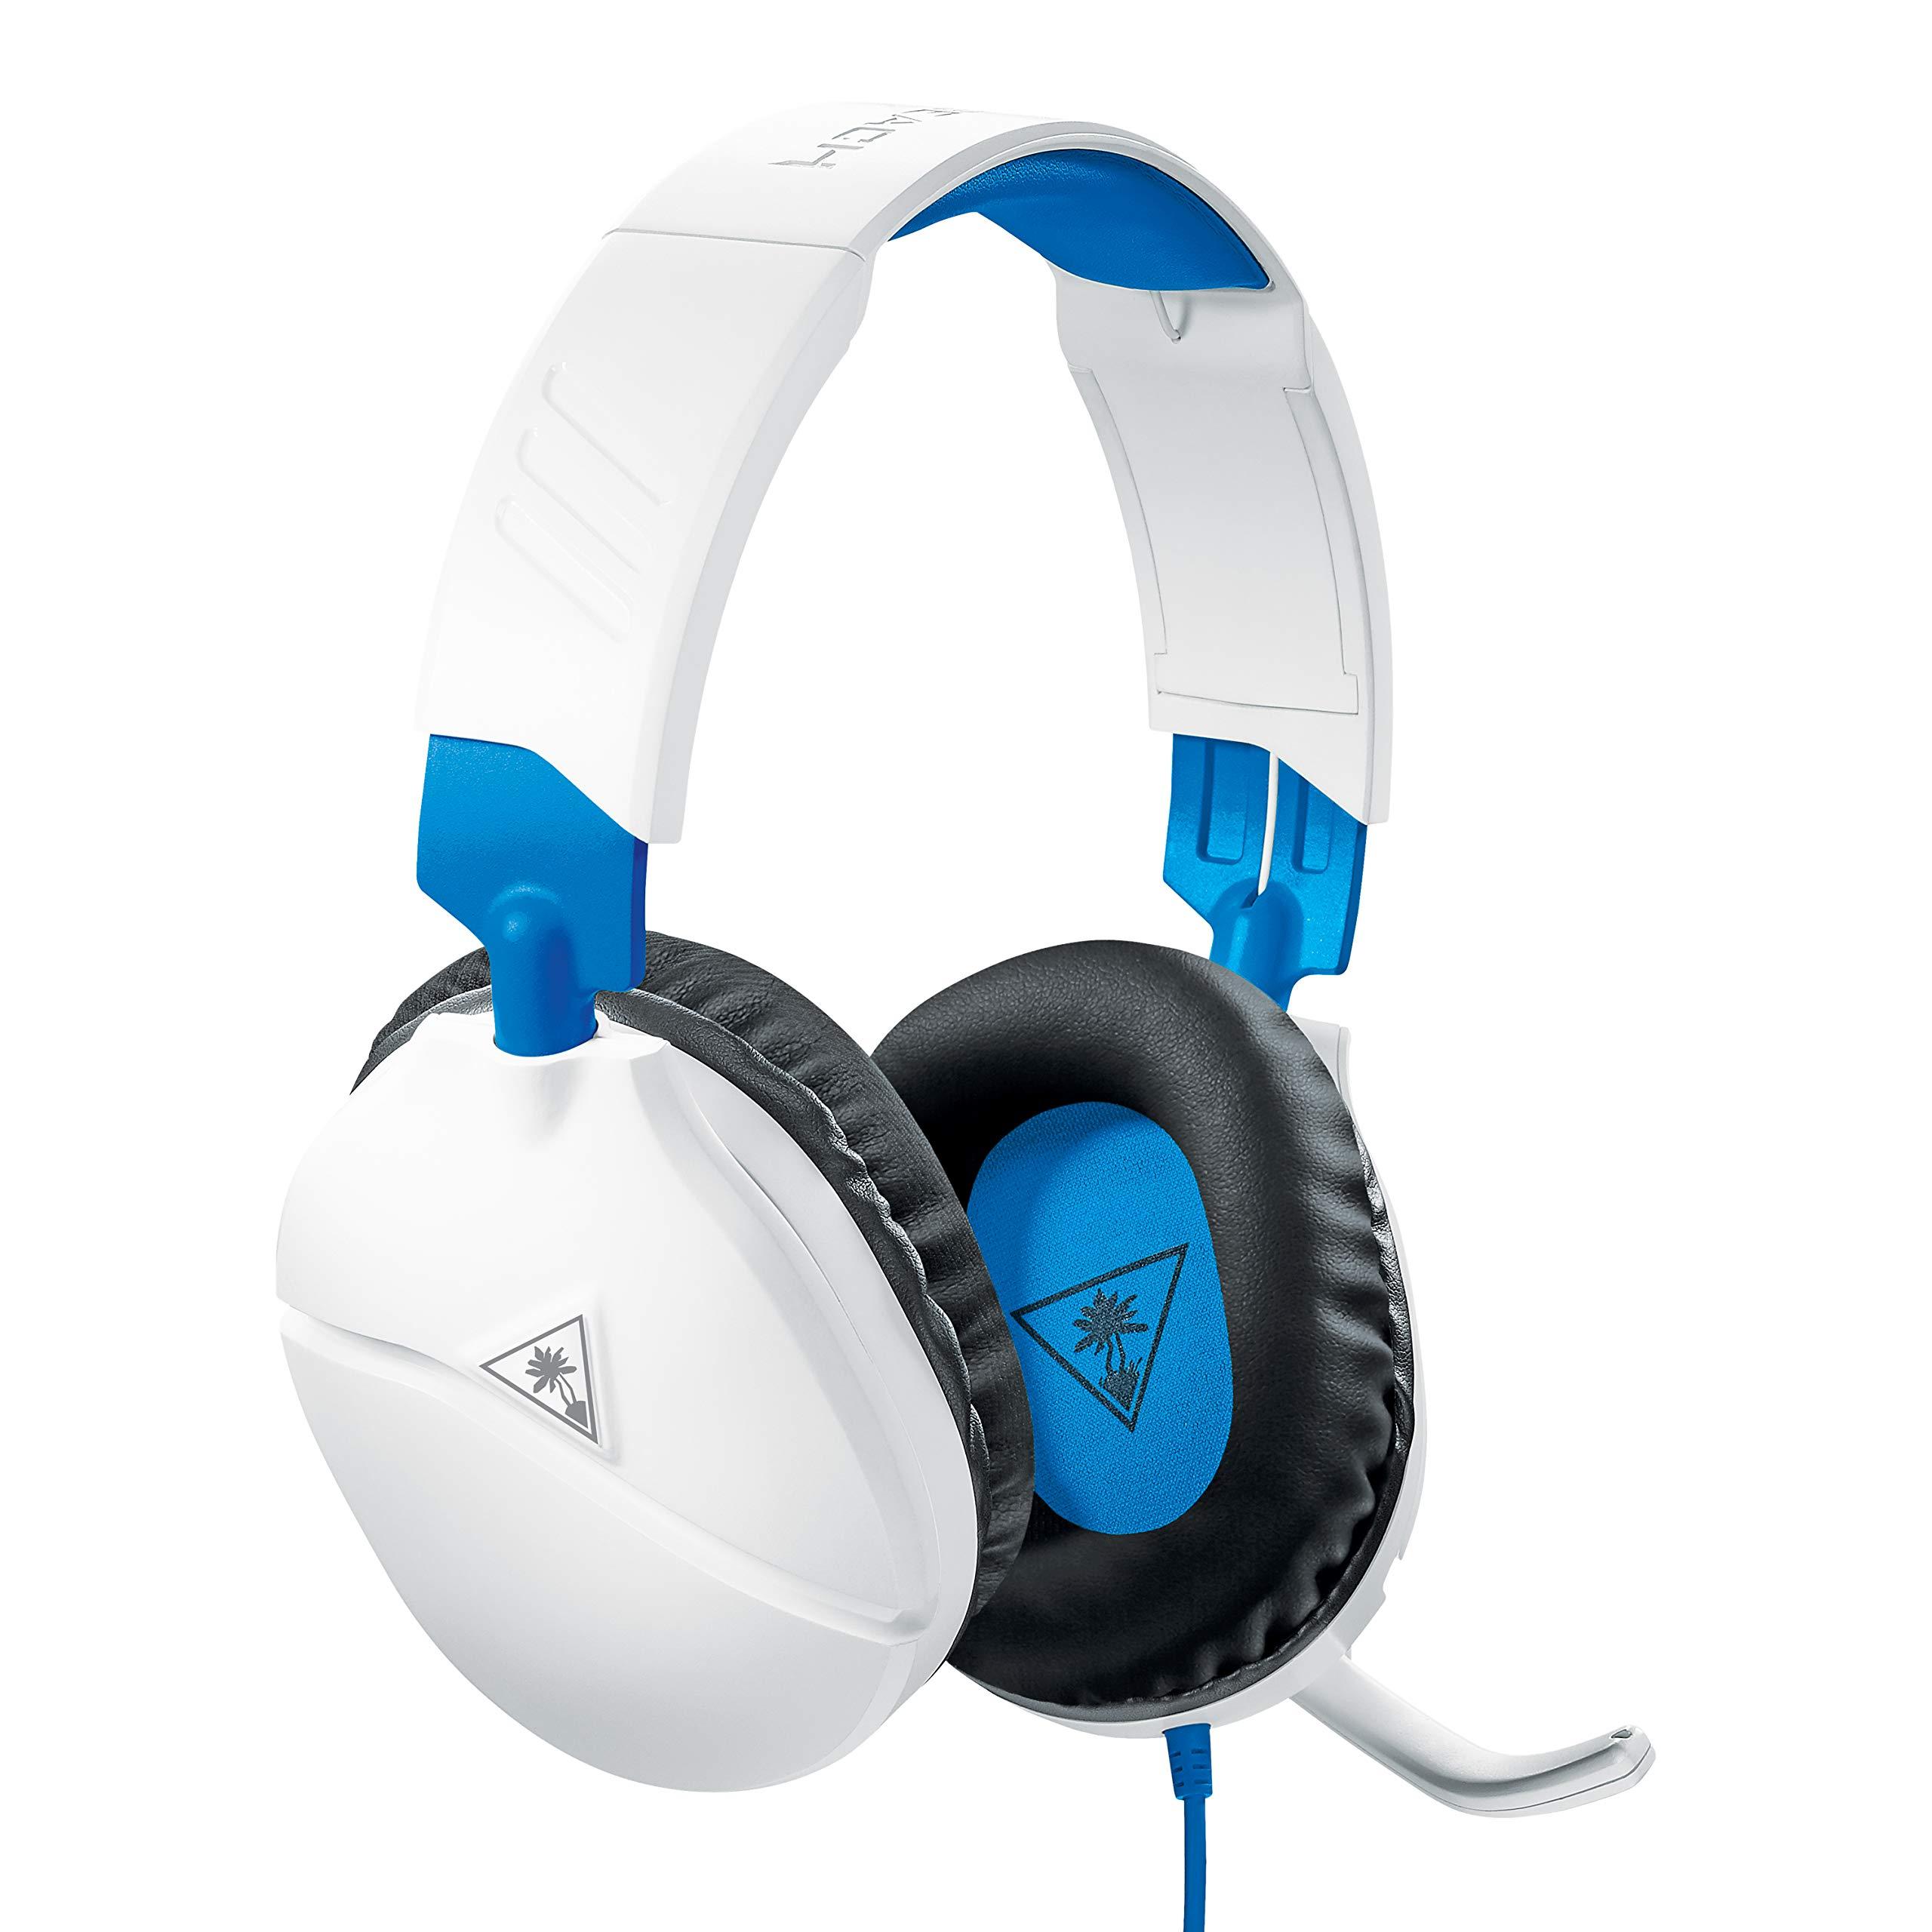 PlayStation 4 Pro、PlayStation 4、Xbox One、ニンテンドースイッチ、PC、および電話用のTurtle Beach Recon 70ゲーミングヘッドセット -  PlayStation 4ホワイト/ブルー